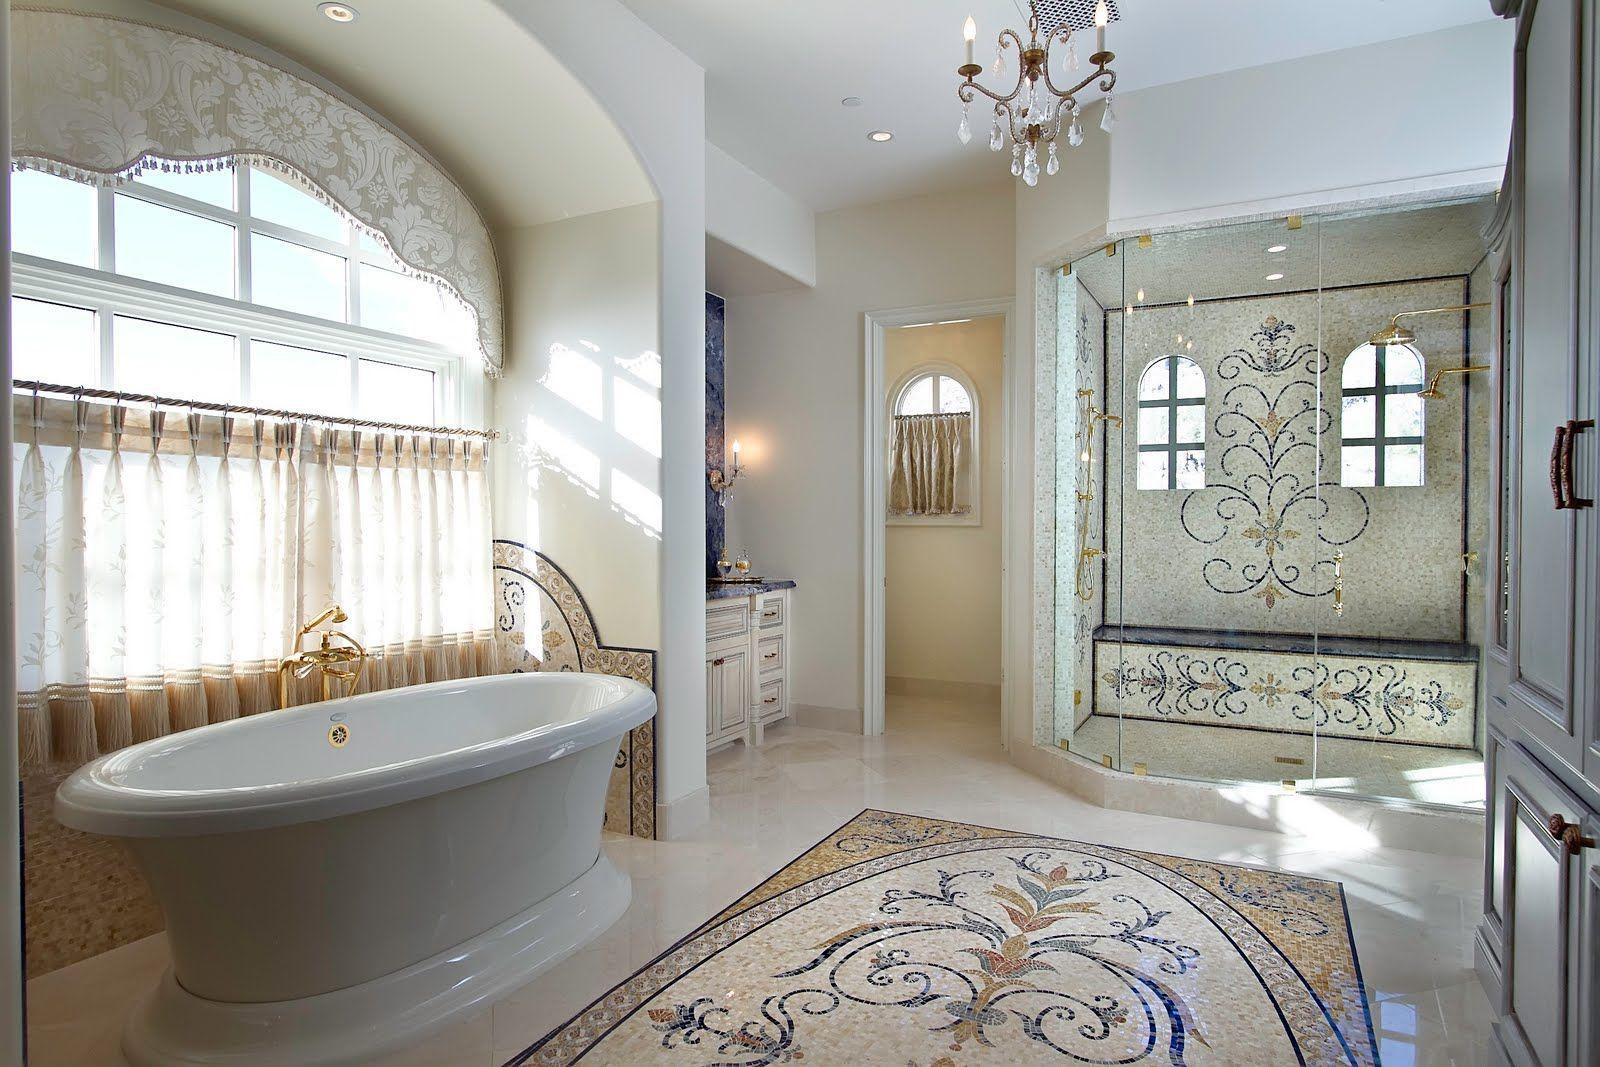 Luxury Bathroom Design With Handcrafted Marble Mosaic Tiles #glass #mosaic  #luxuriousmodernbathroom